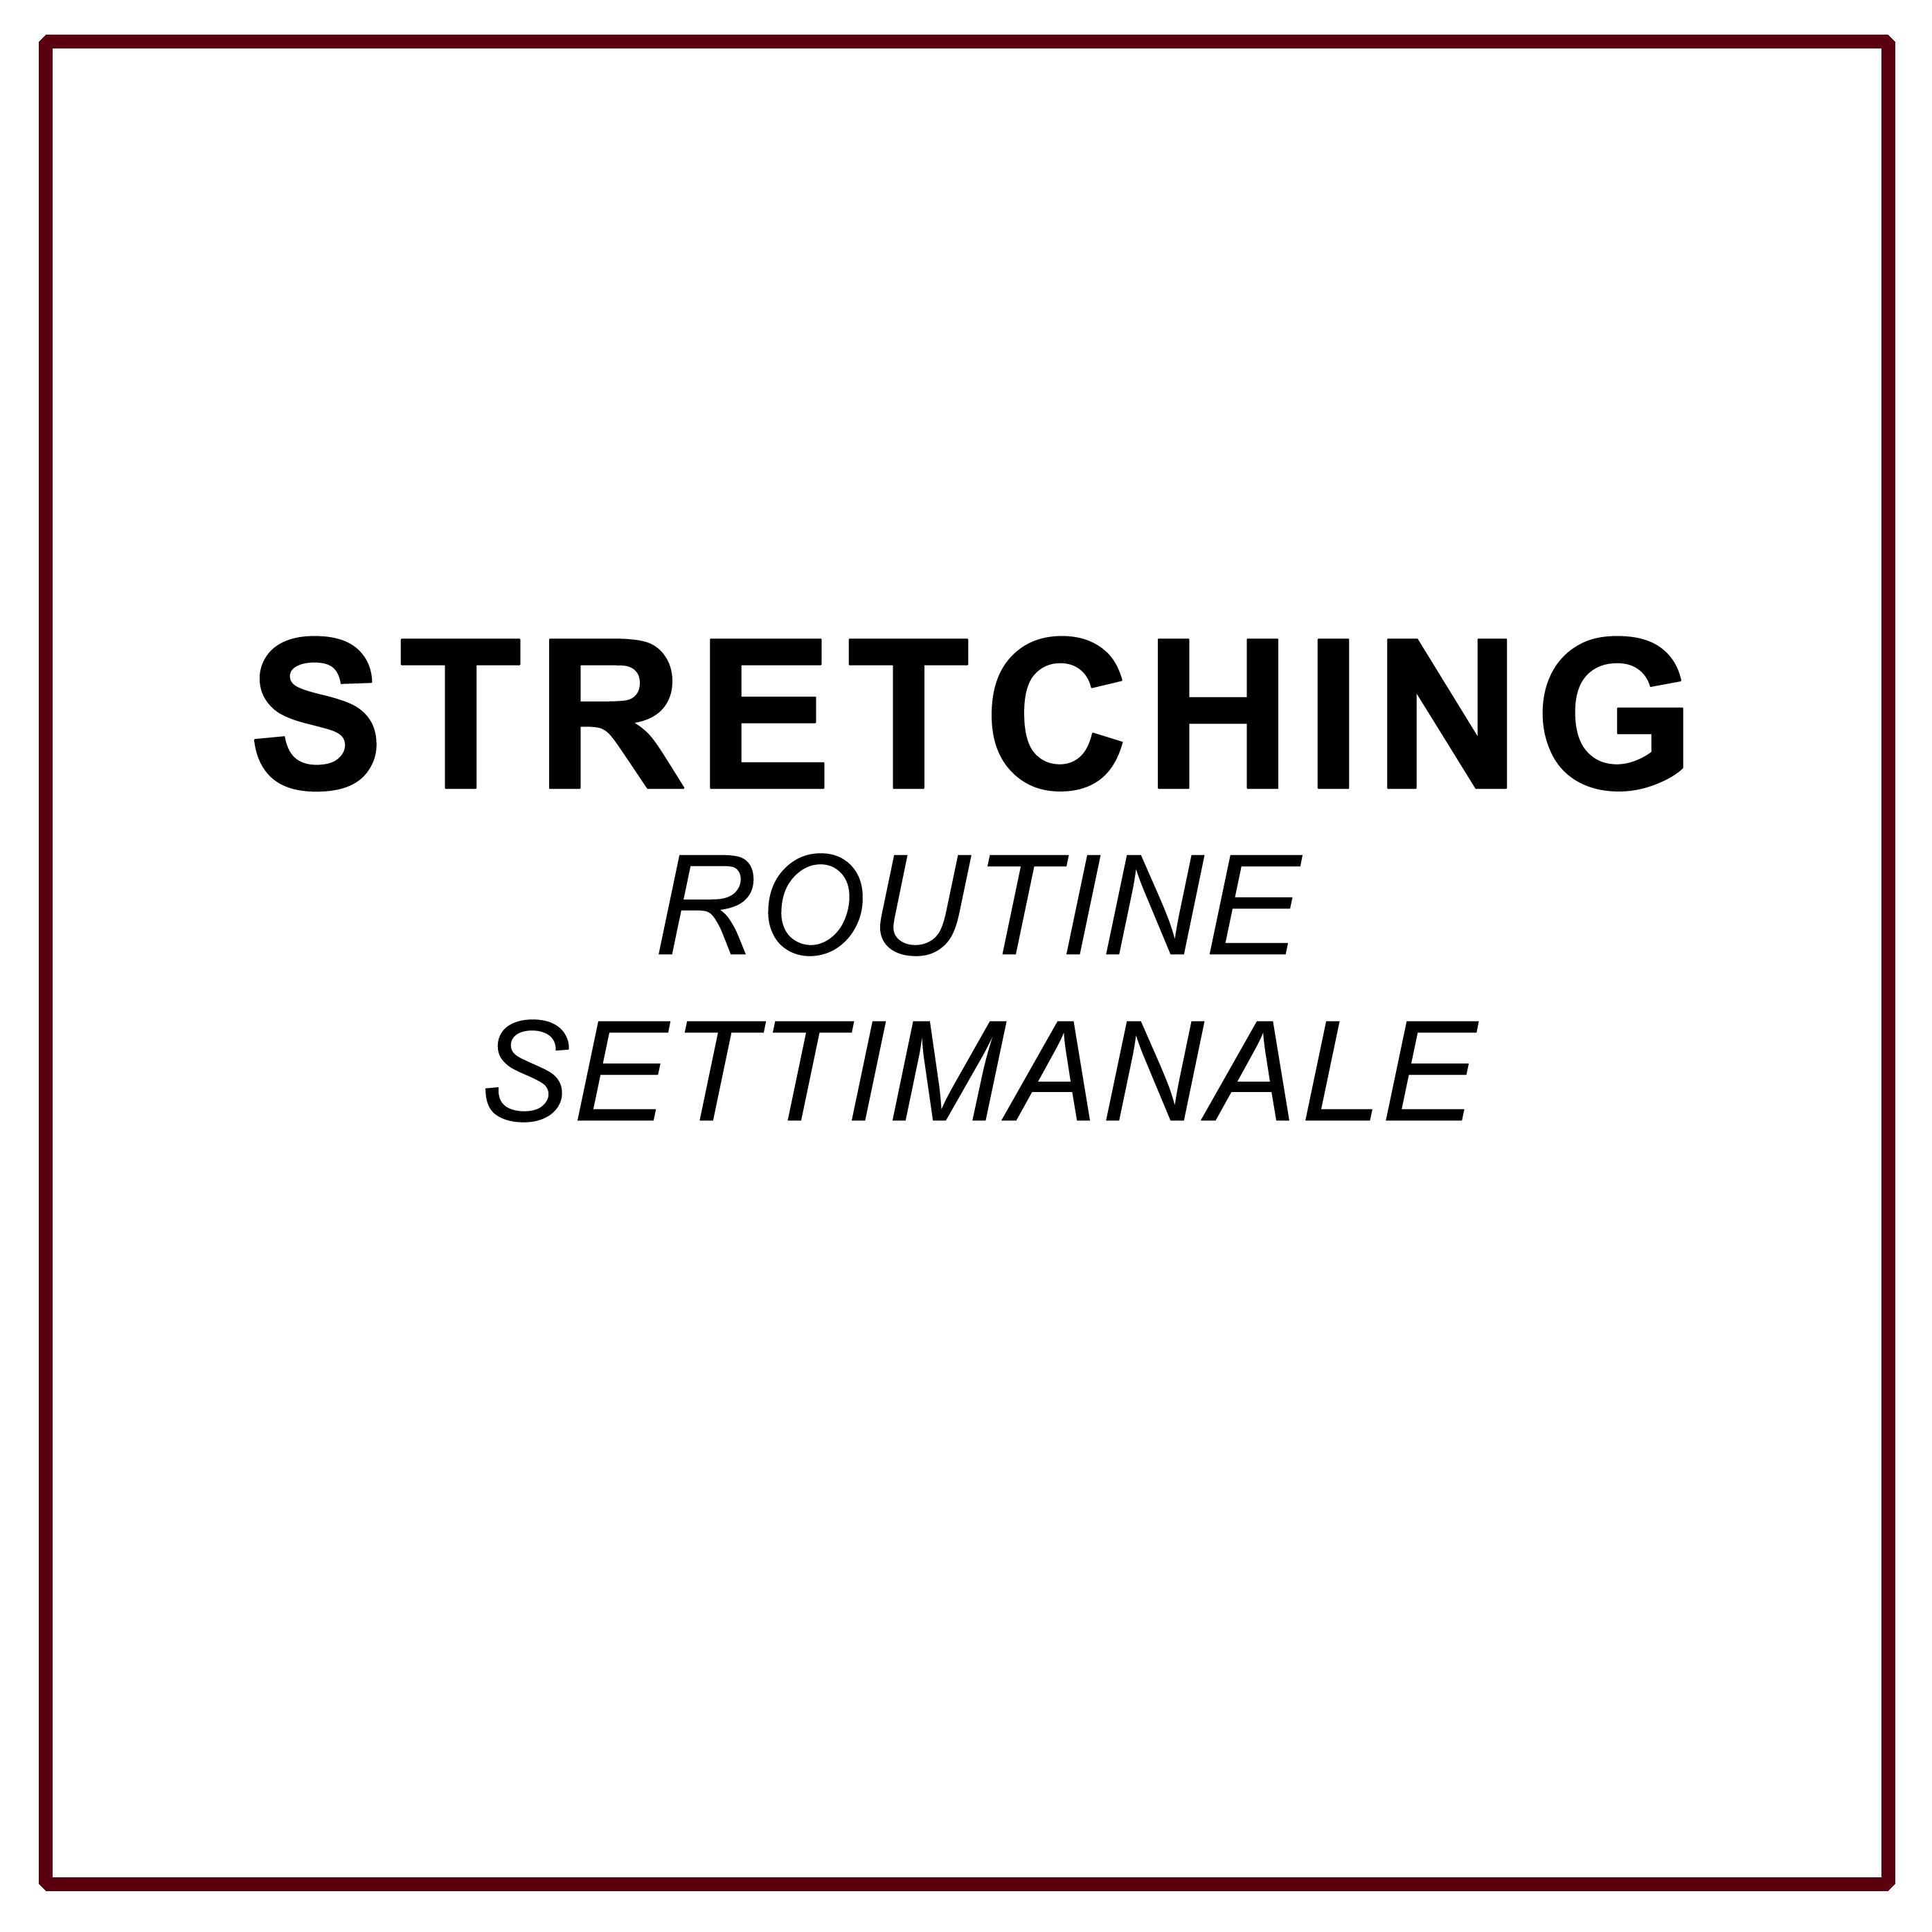 STRETCING